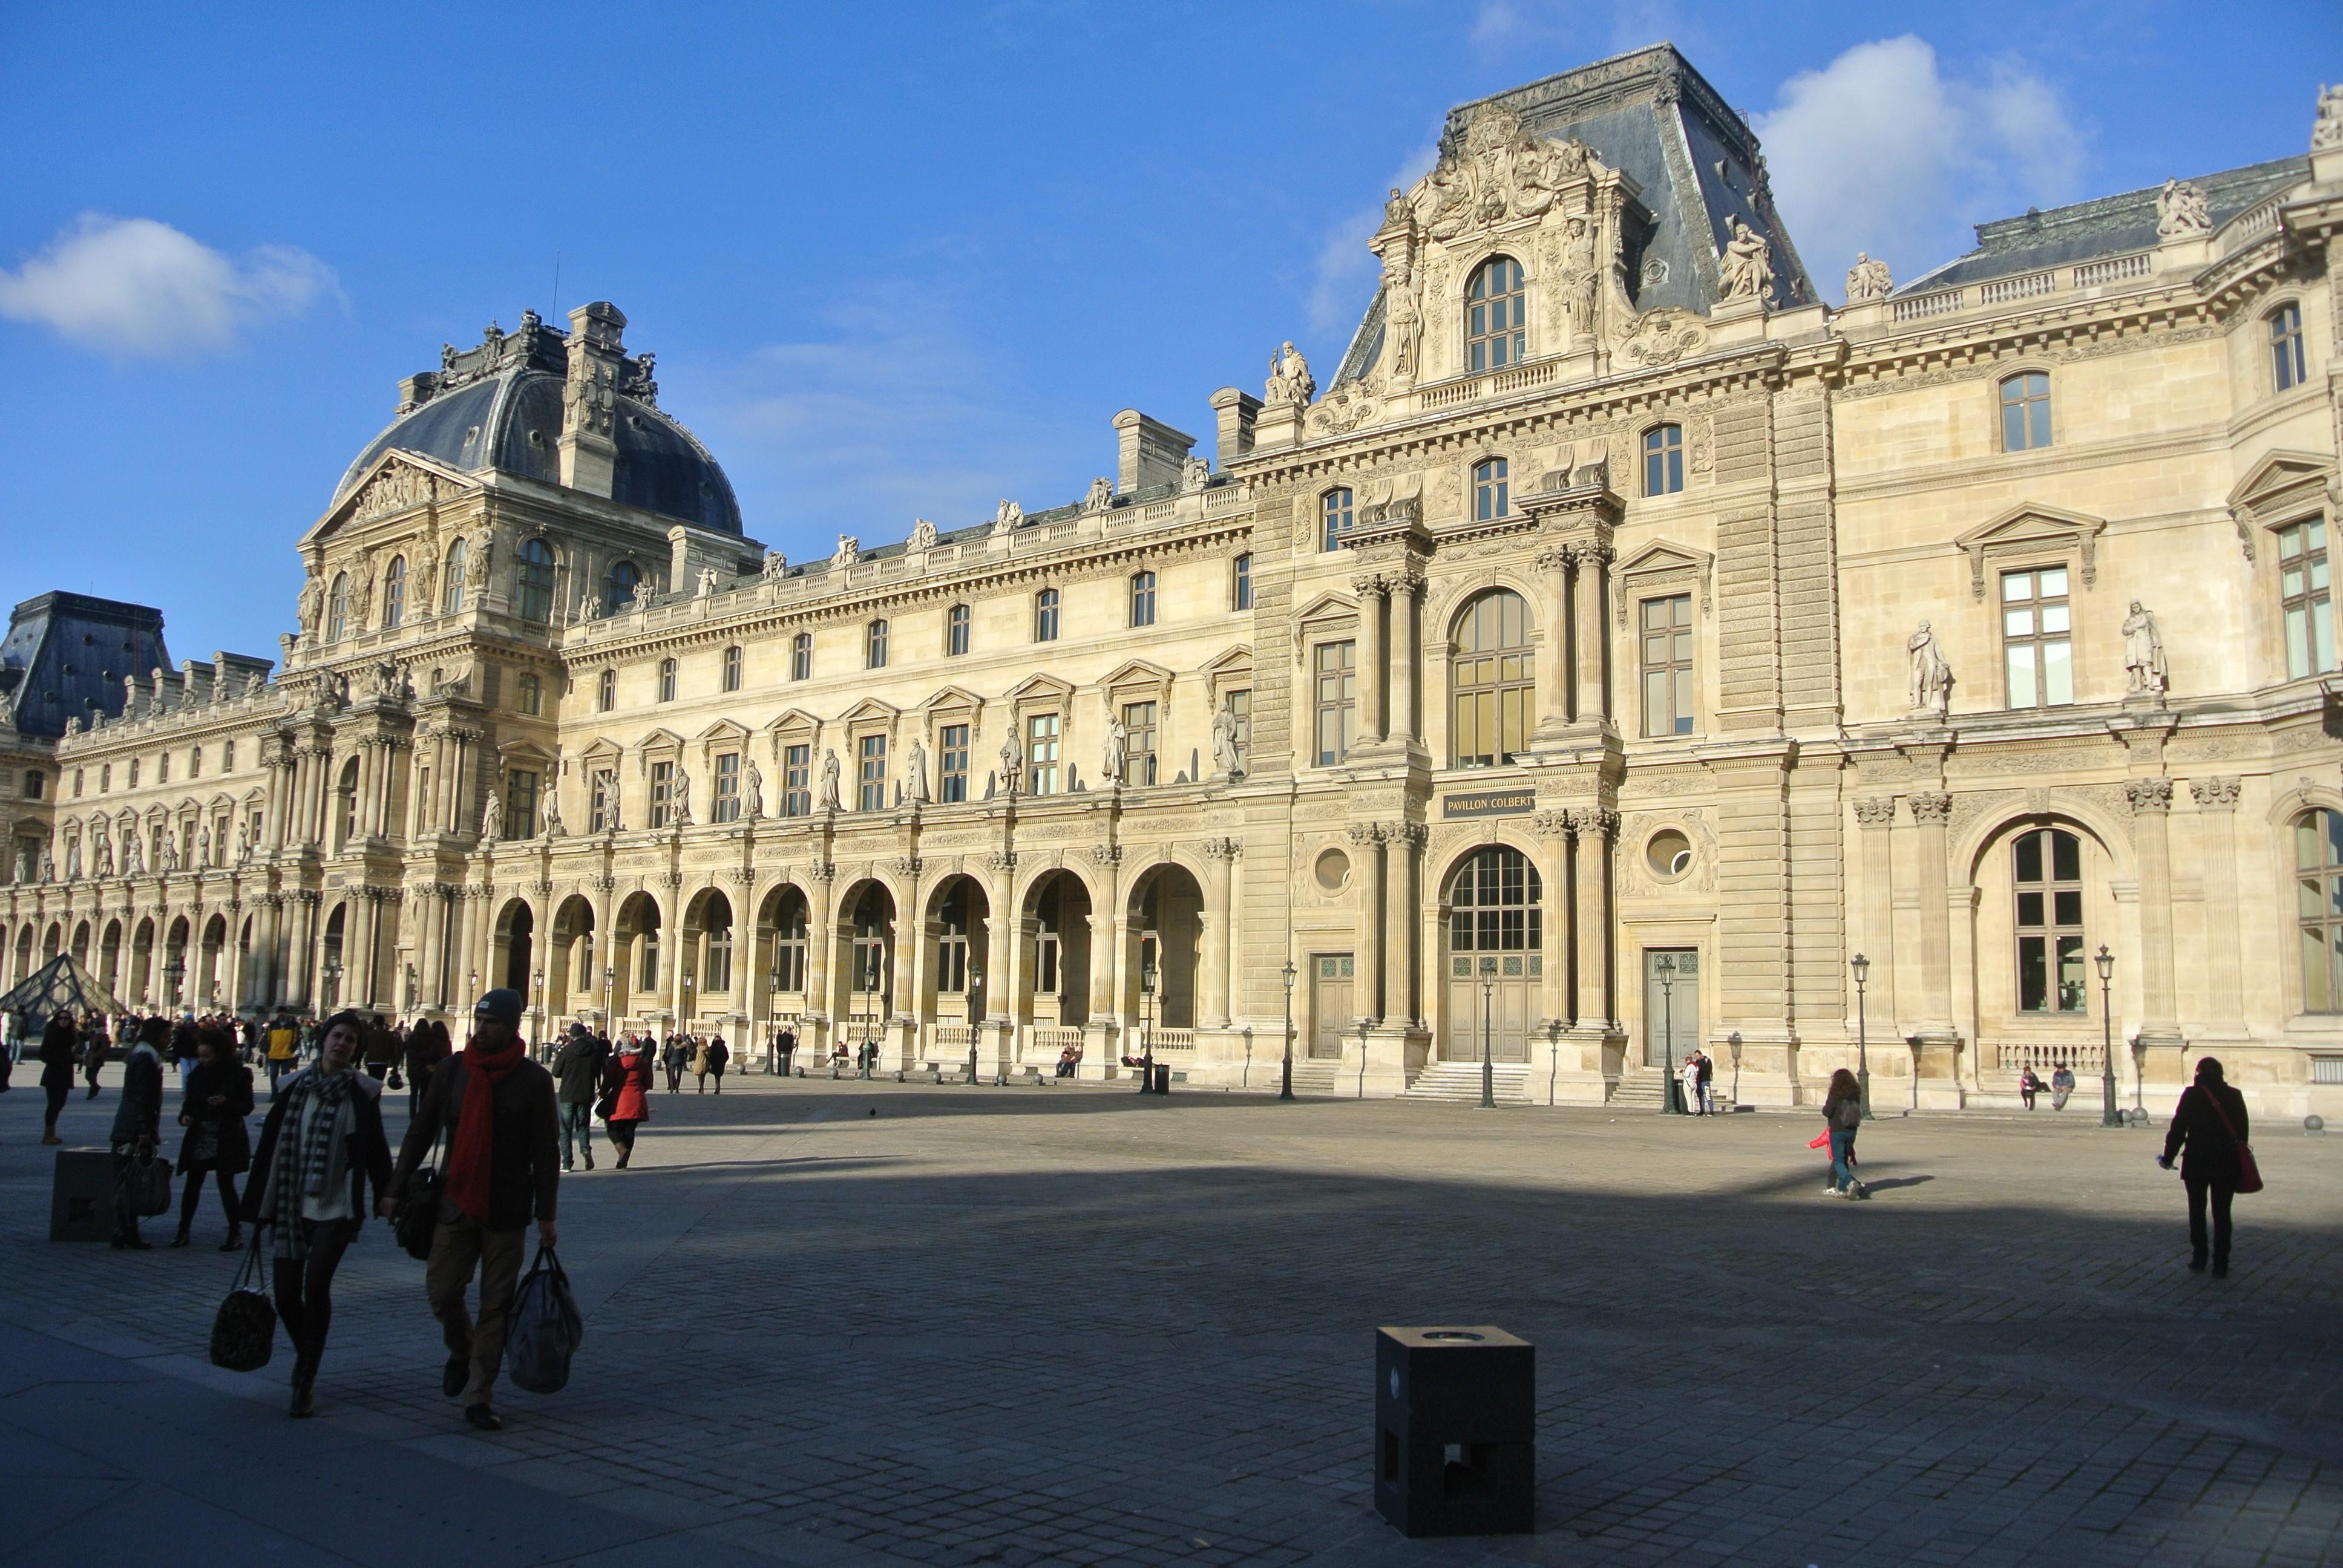 The Louvre, Paris | Todd's Travels Travel Blog